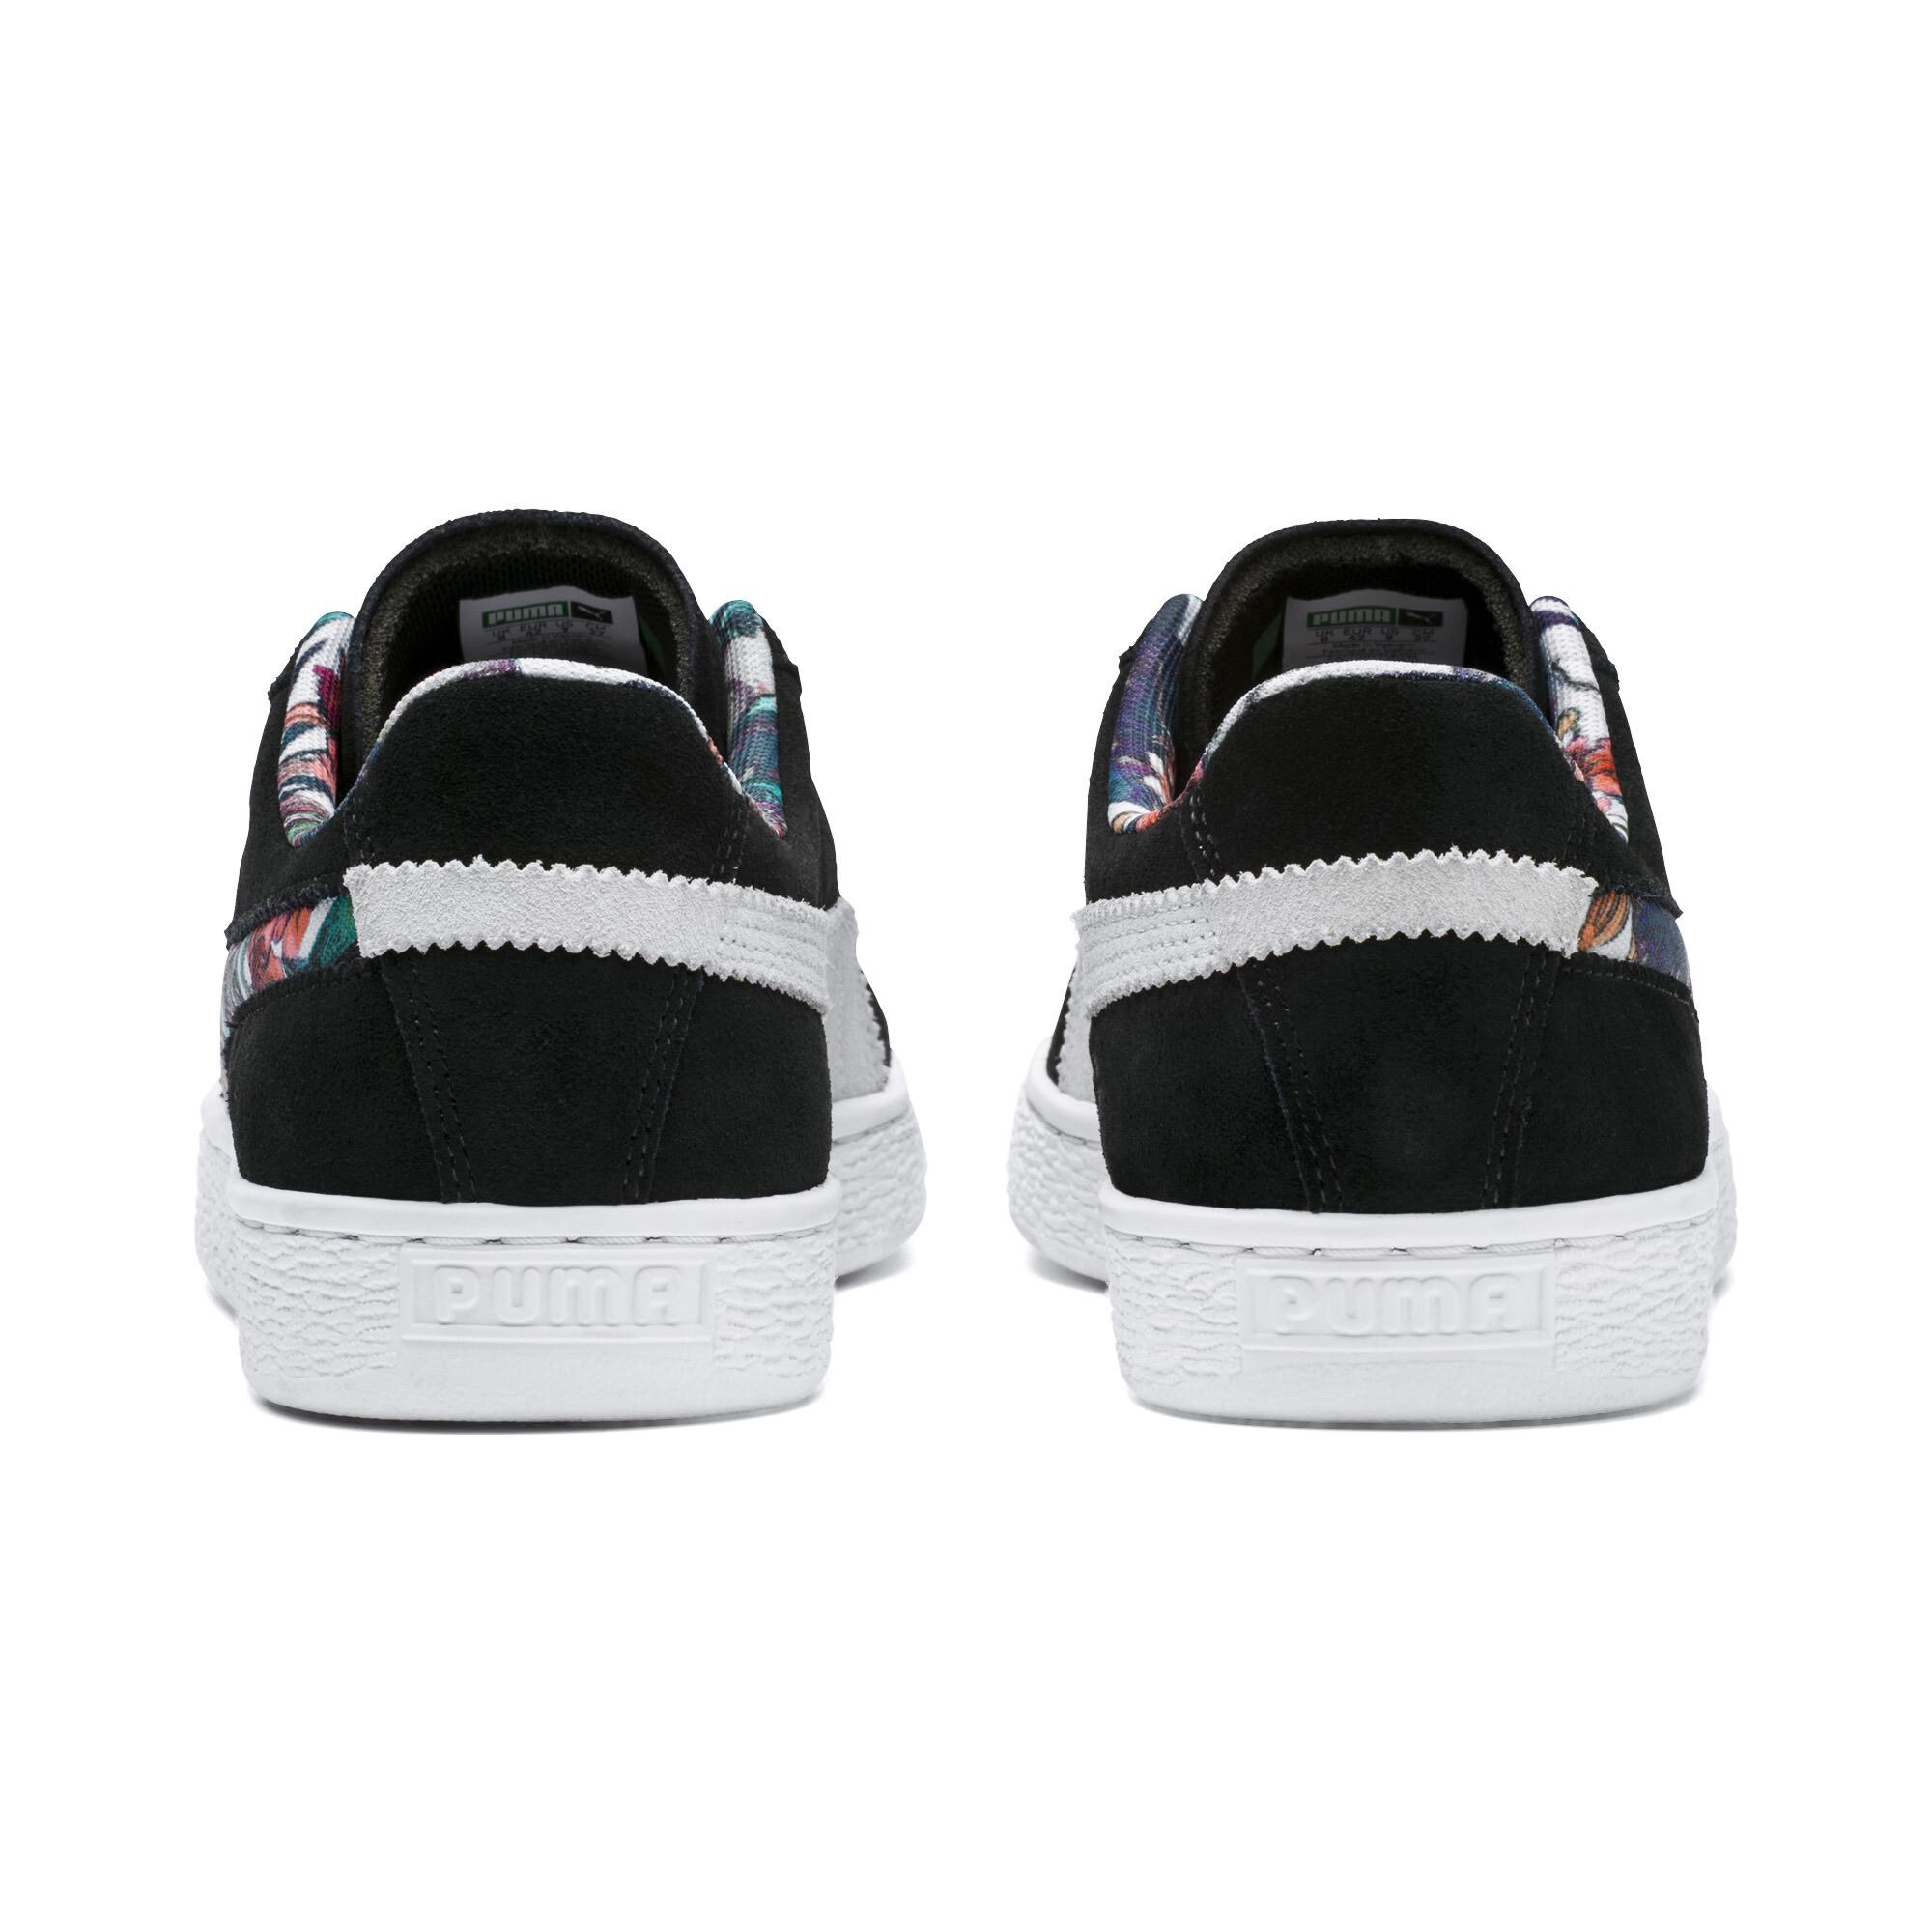 Image Puma Suede Secret Garden Sneakers #3